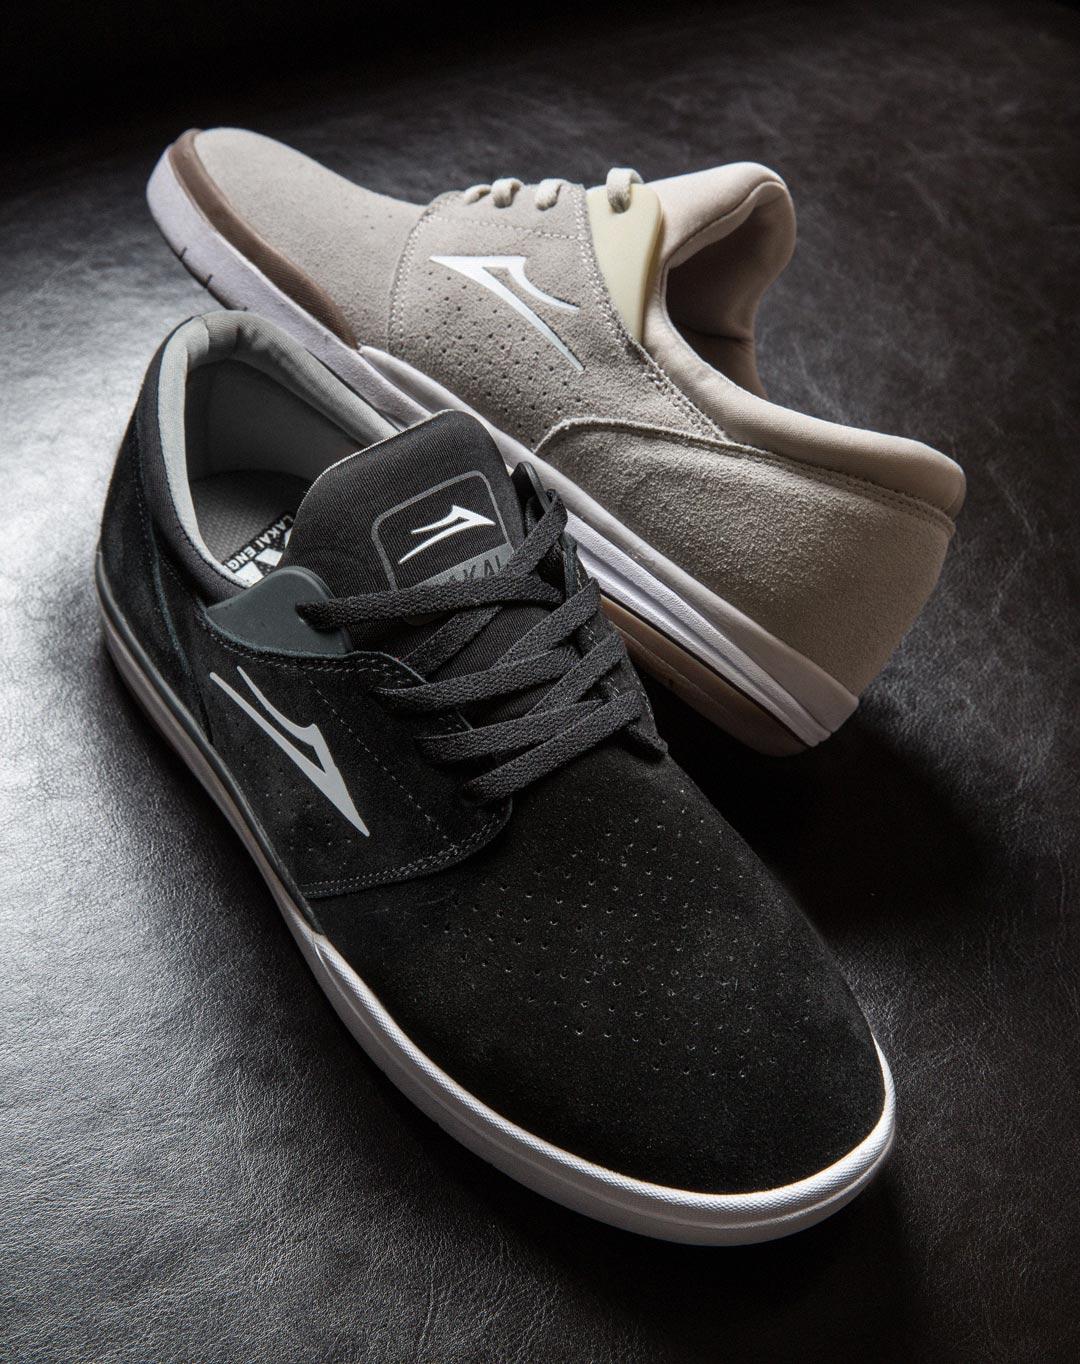 Skate shoes 2017 - Skate Shoes 2017 15